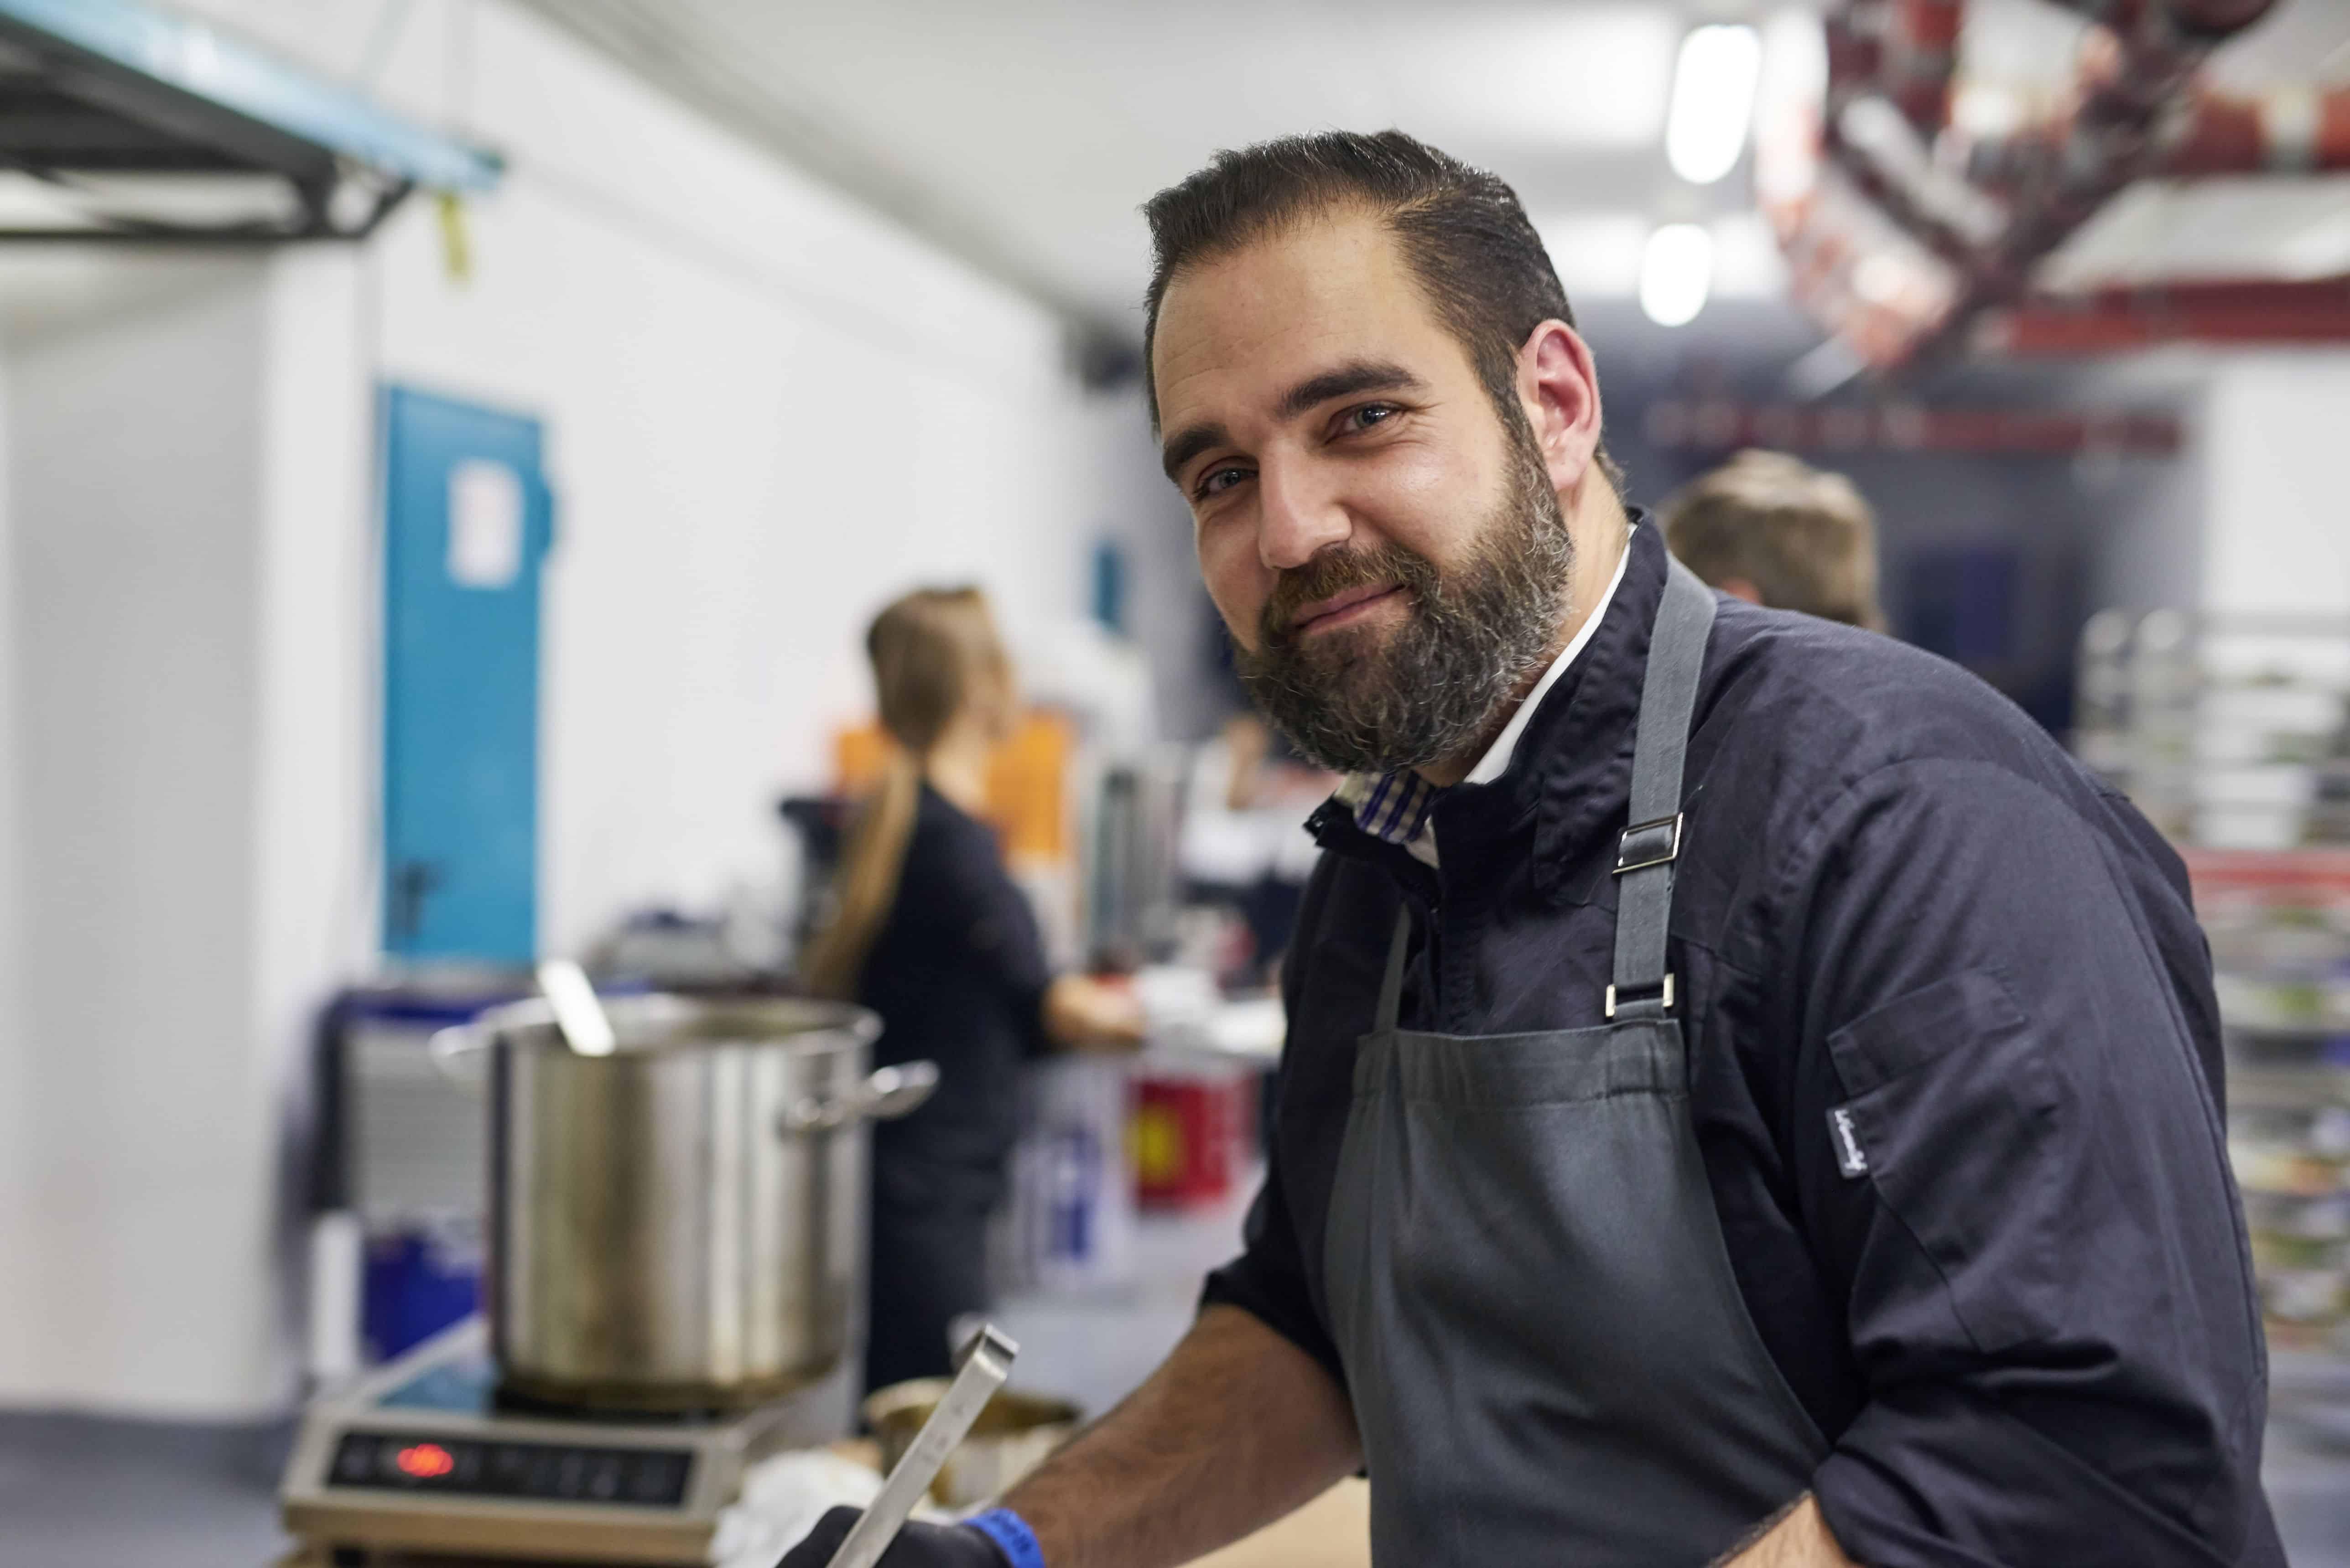 Bosseln und Kallen Catering Essen Foodtruck (3)